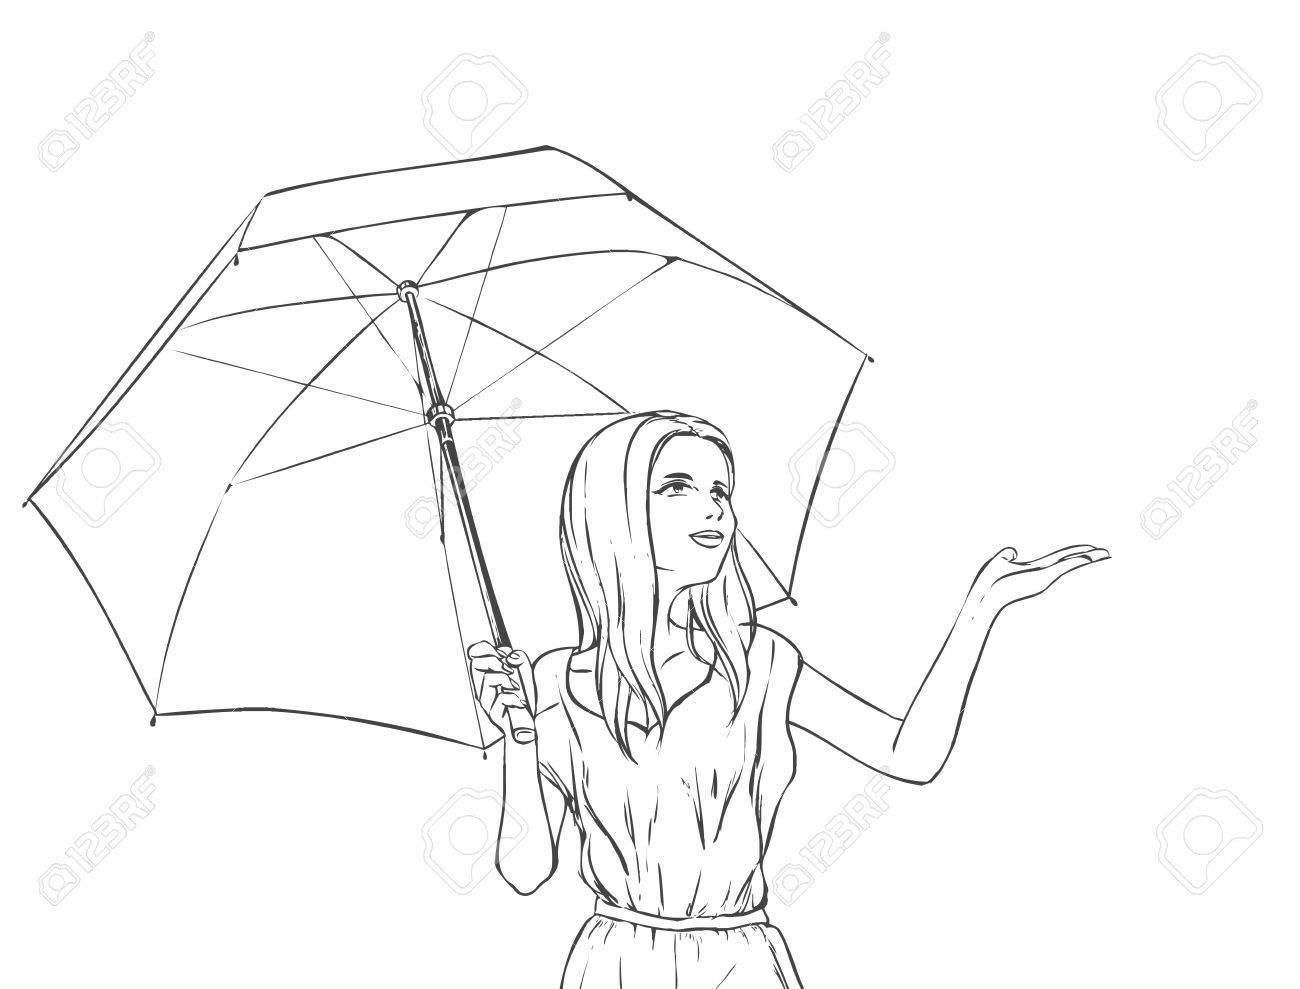 1300x989 Summer Portrait Of Young Slim Beutiful Girl Under Umbrella